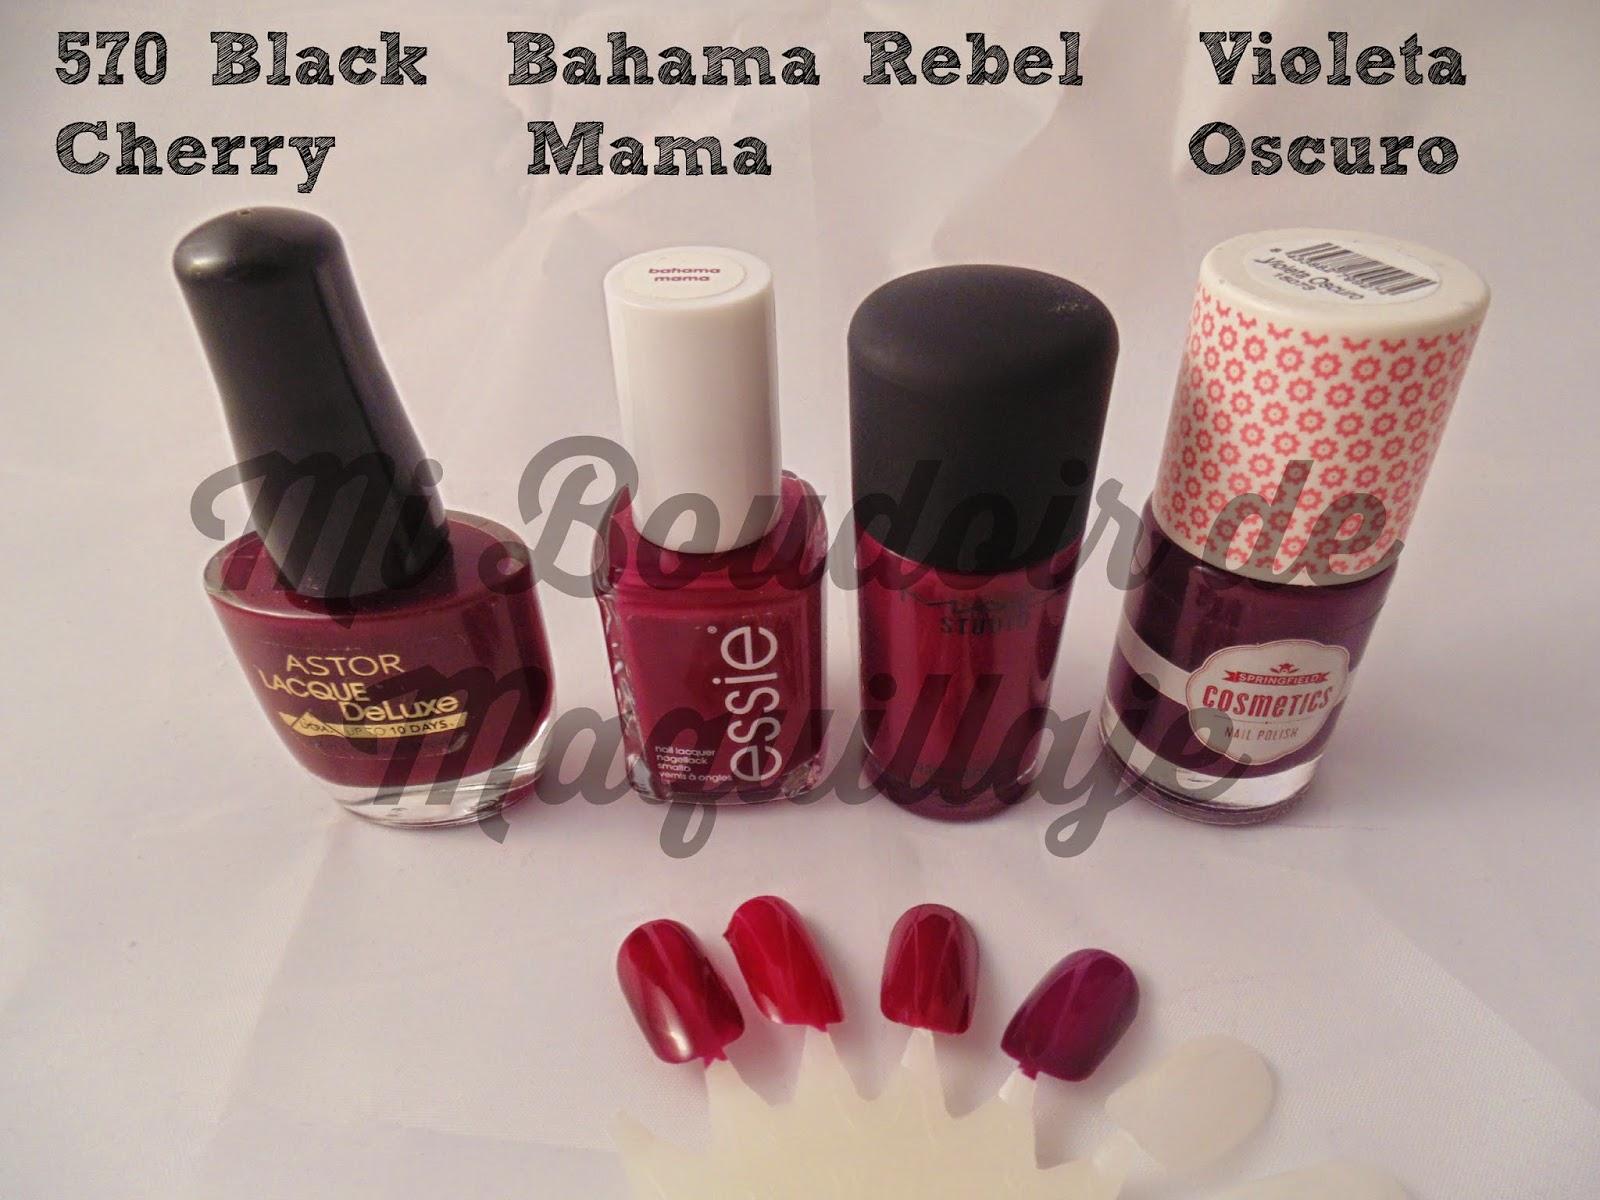 Essie, Astor, Mac, Springfield nails uñas, laca de uñas